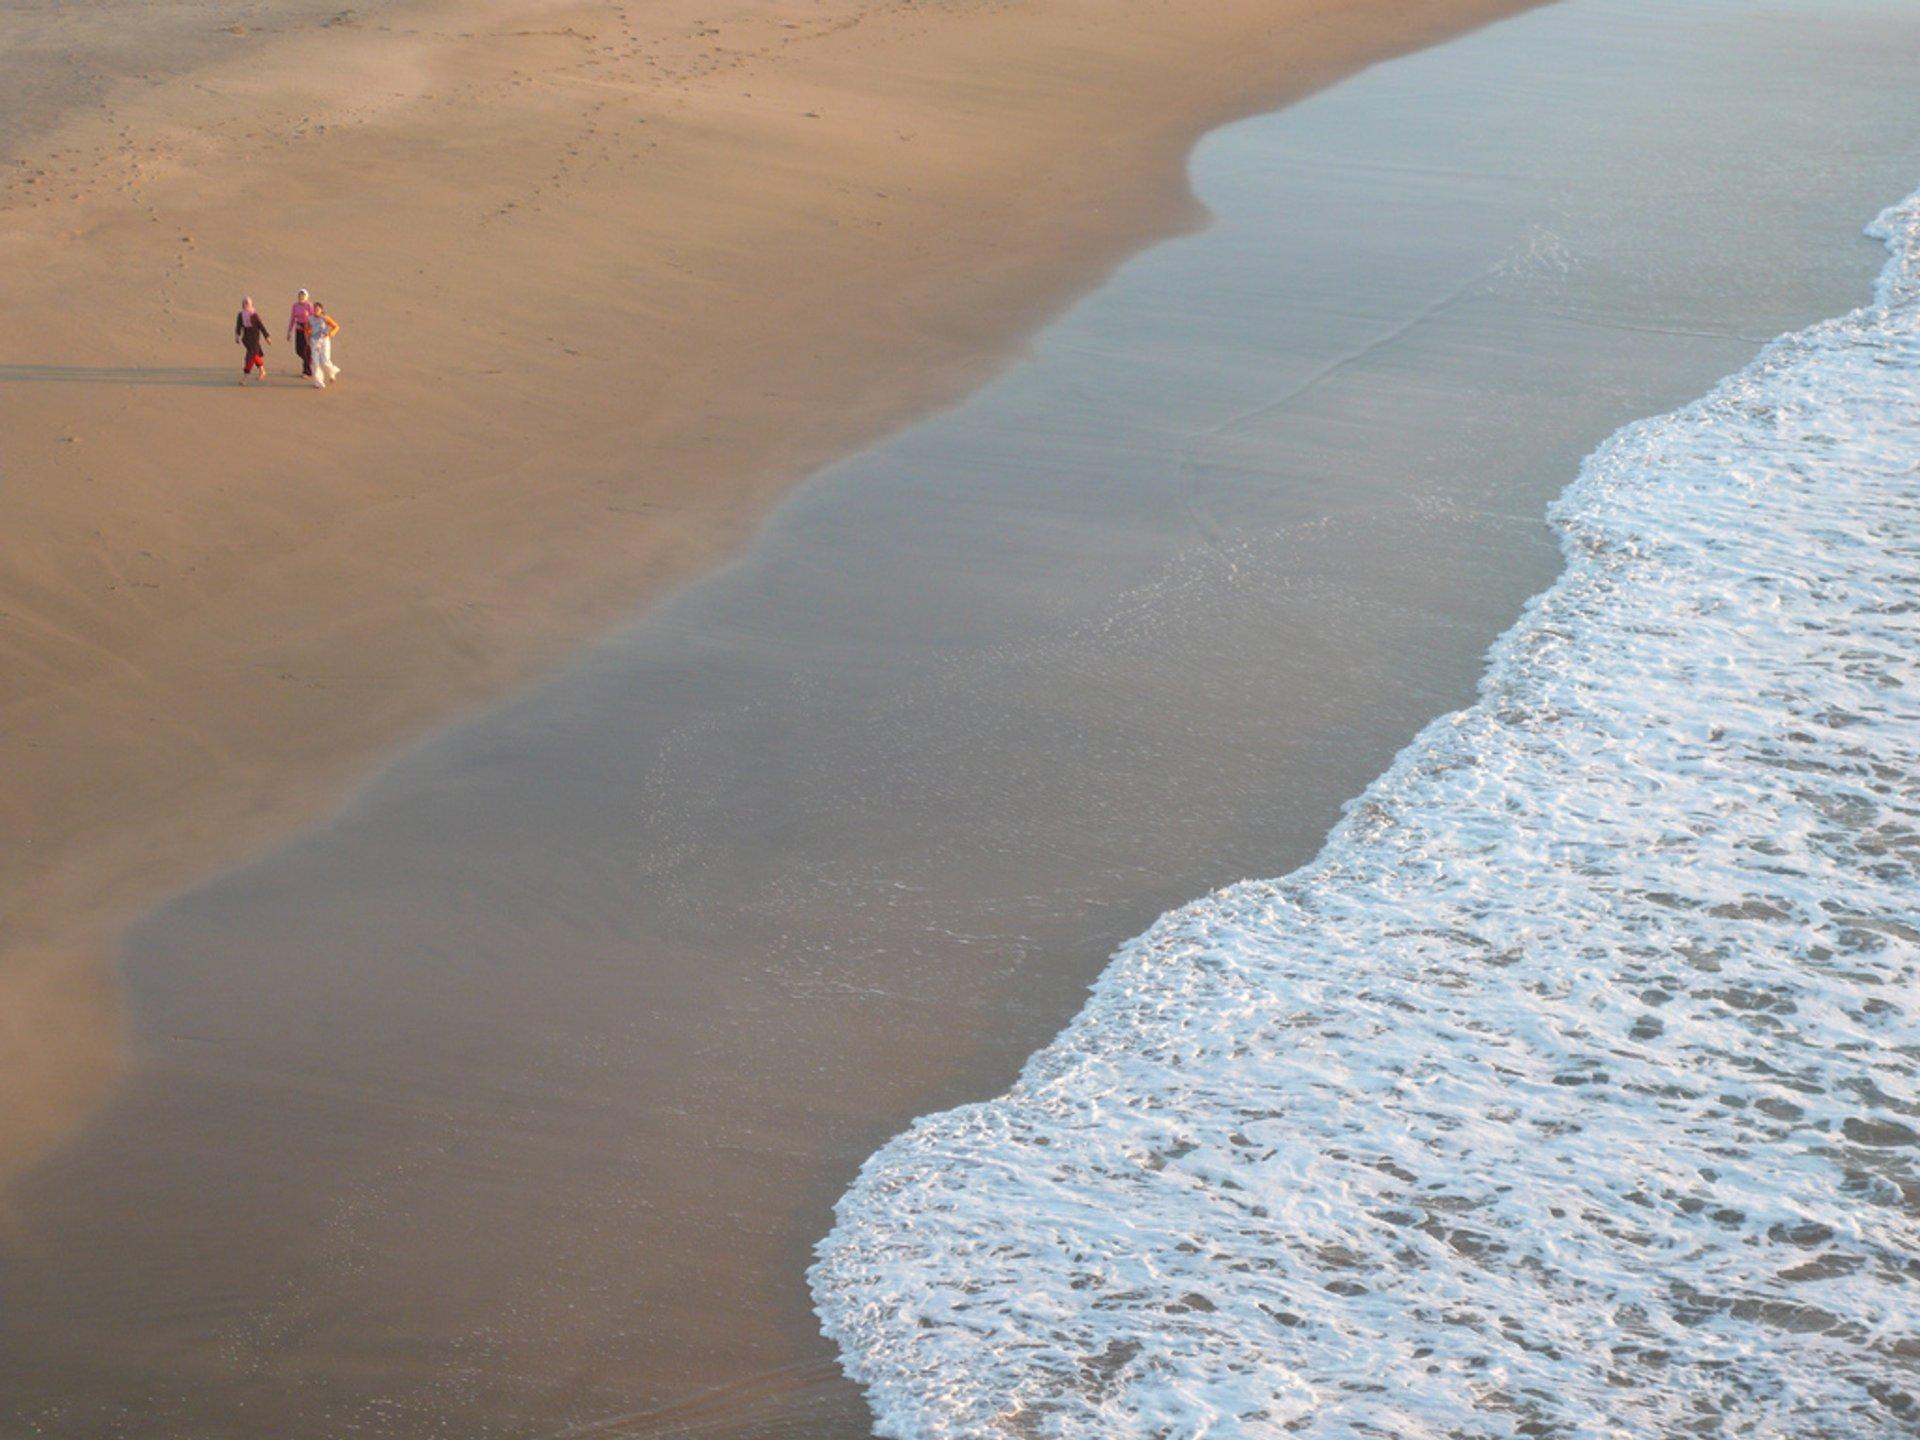 Beach Season in Morocco 2020 - Best Time